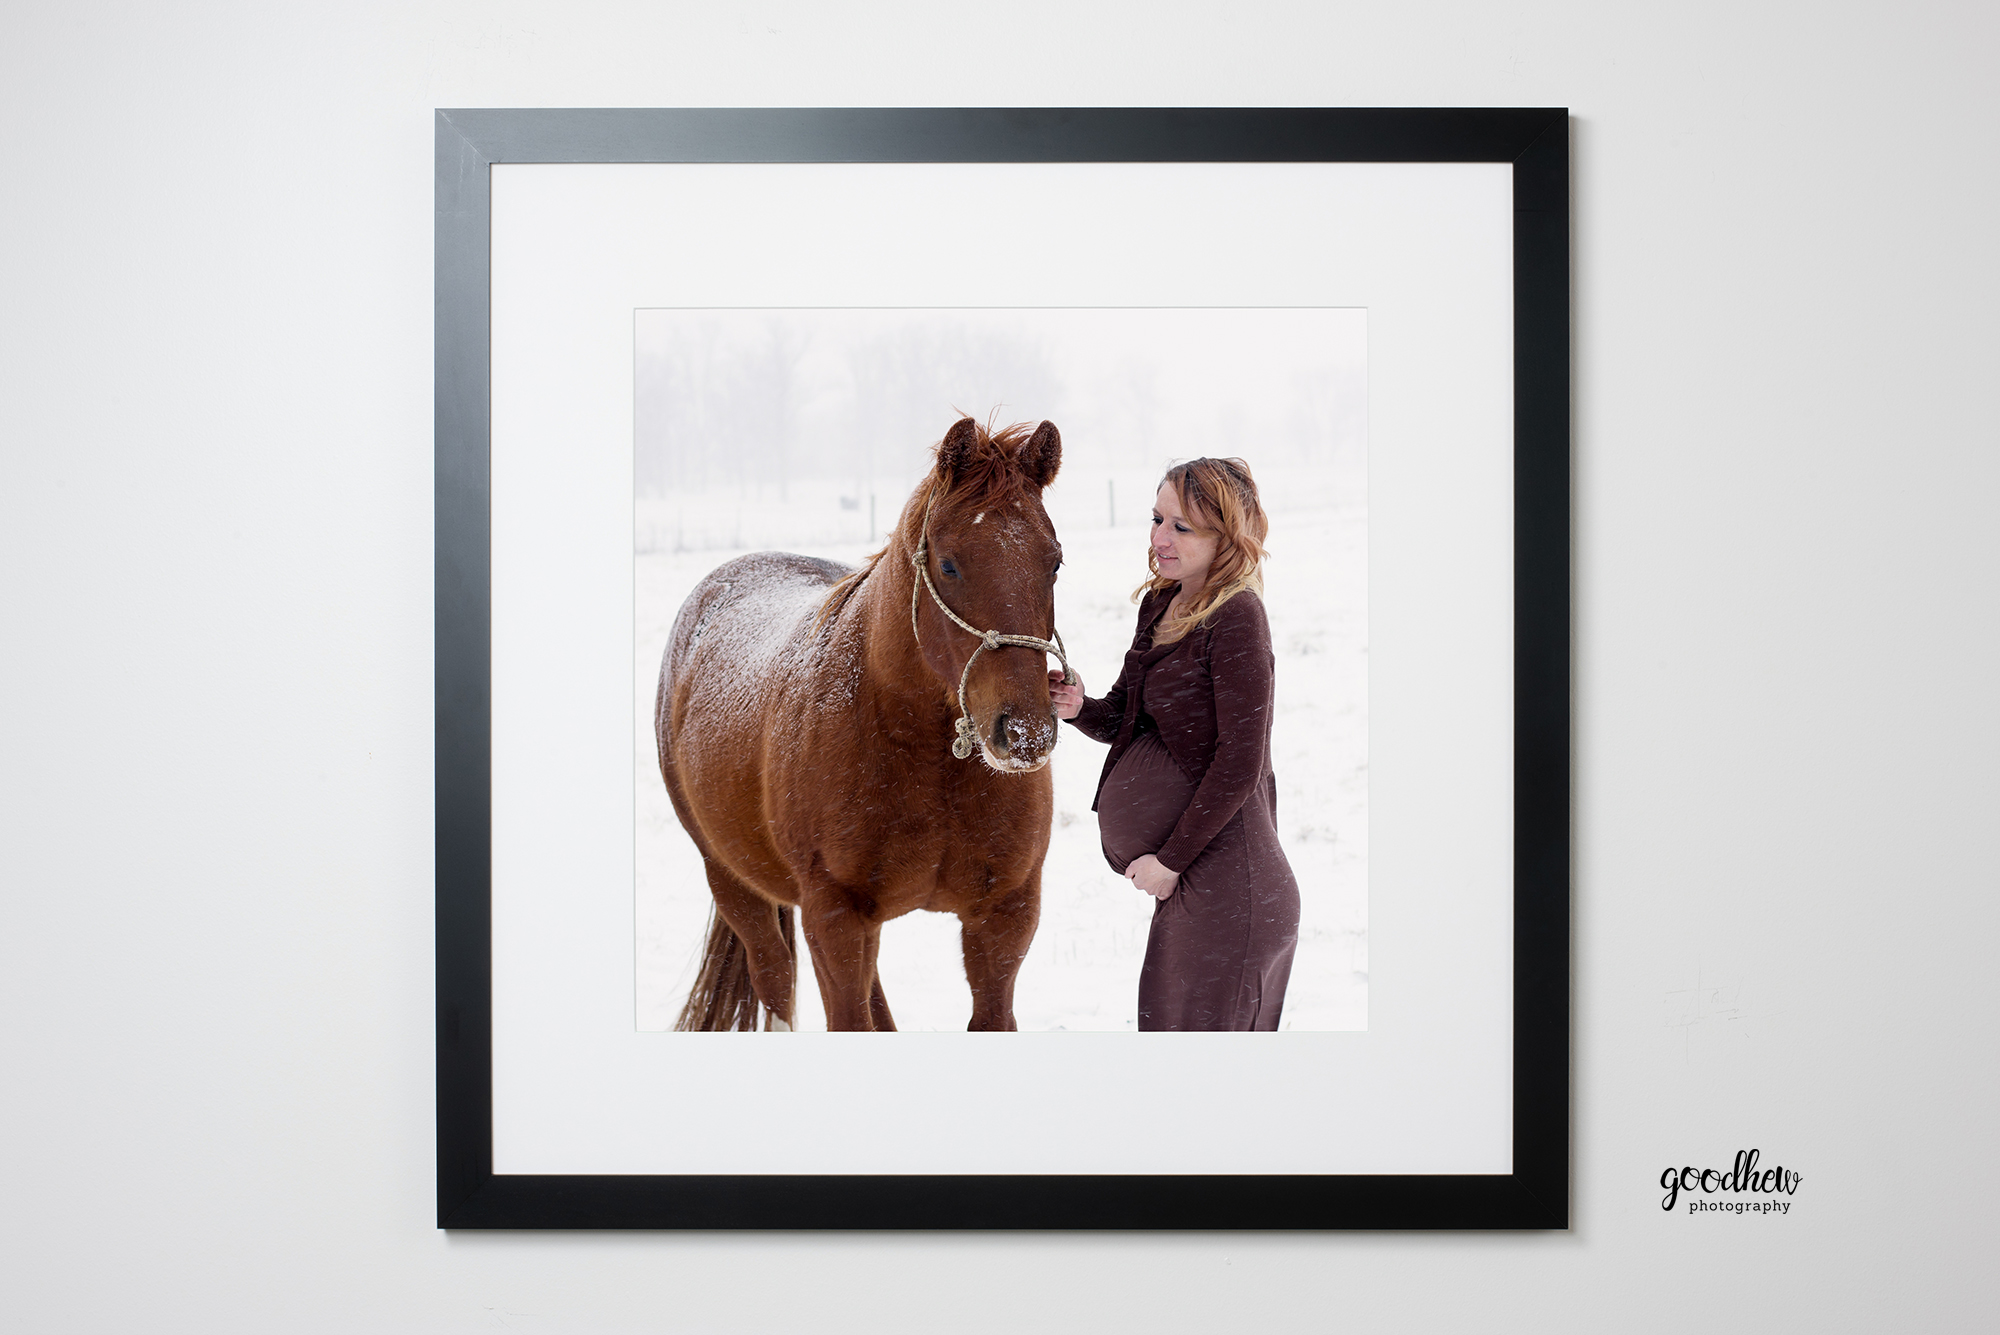 Jackson-Mi-Maternity-Portrait-horse-snow